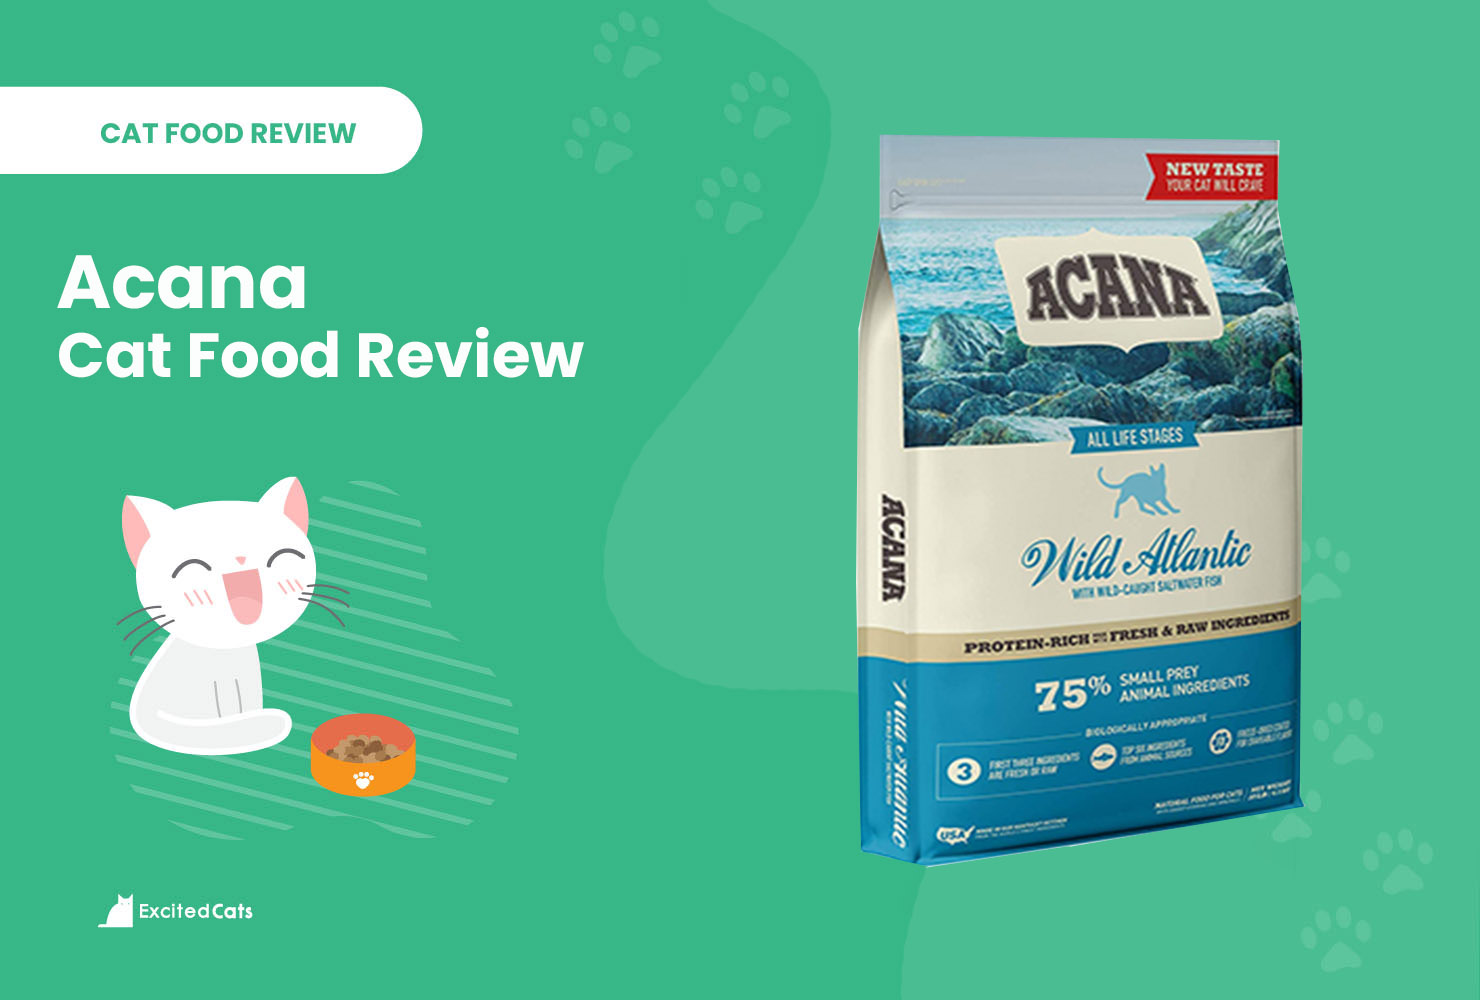 acana cat food review